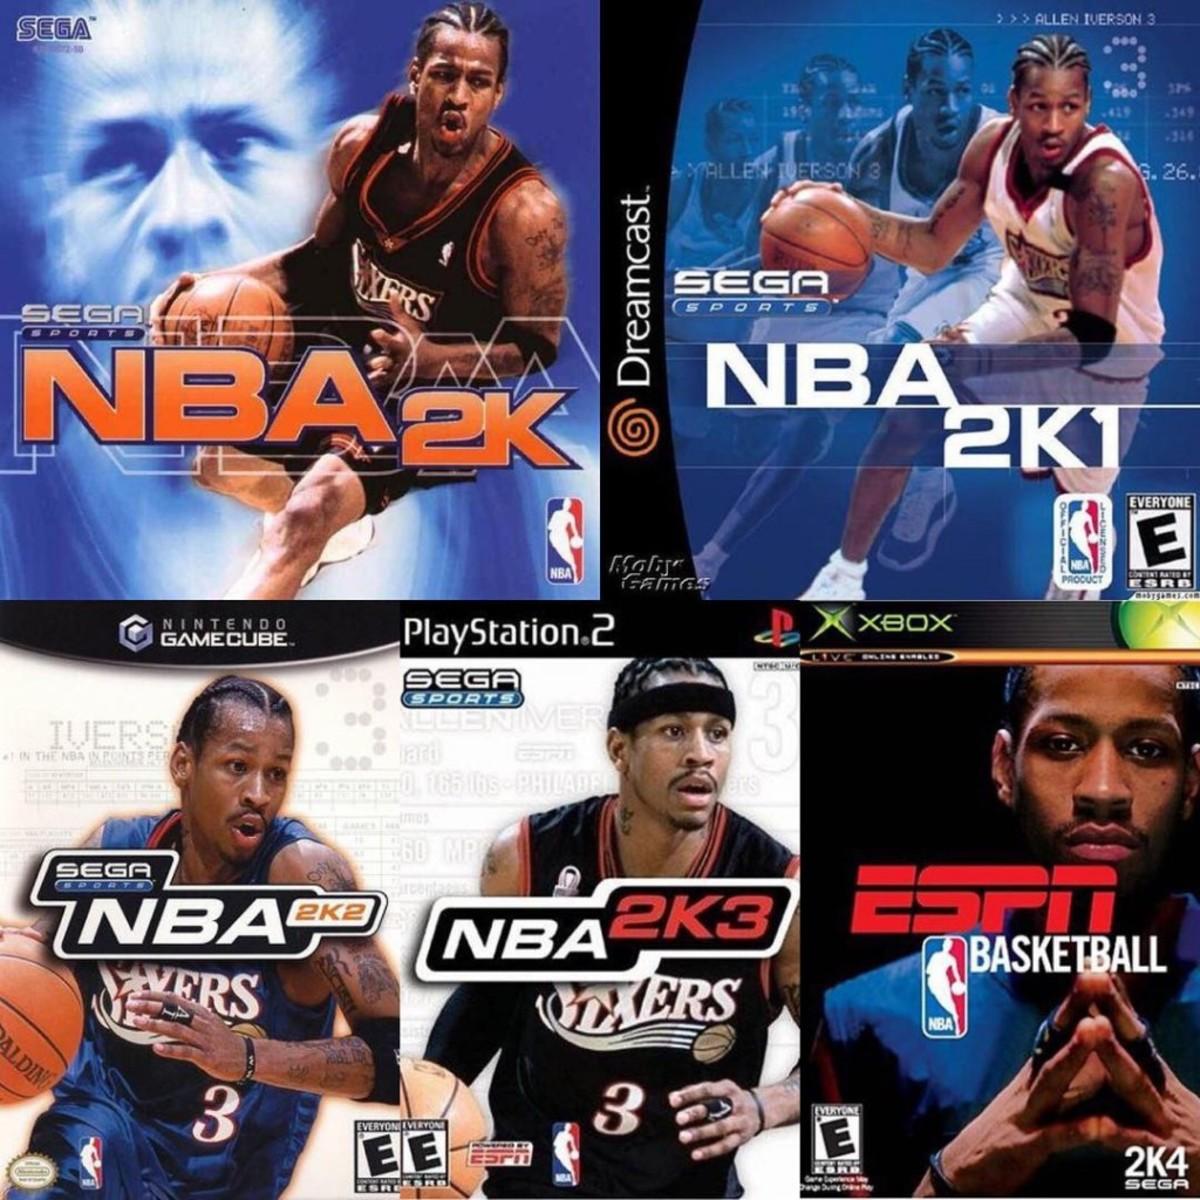 NBA 2K Covers Through The Years